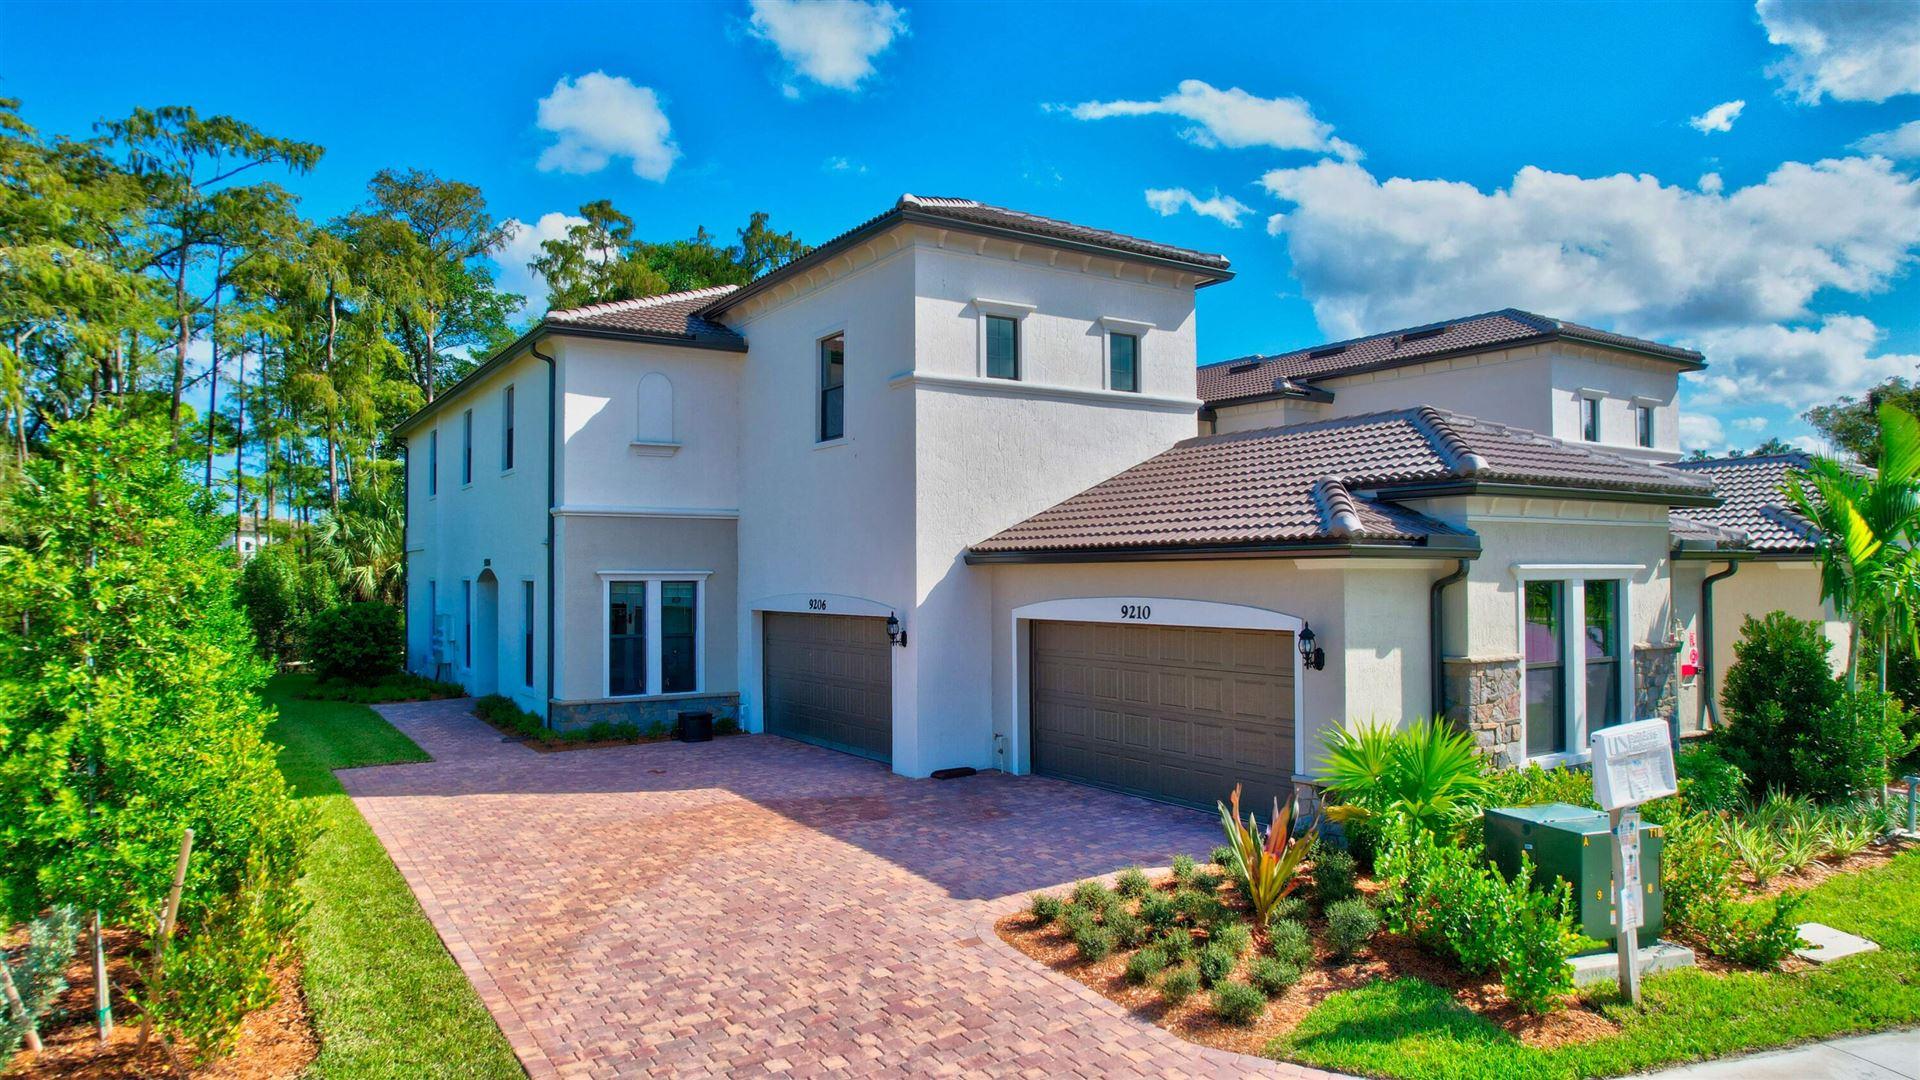 9206 Passiflora Way, Boca Raton, FL 33428 - MLS#: RX-10749919